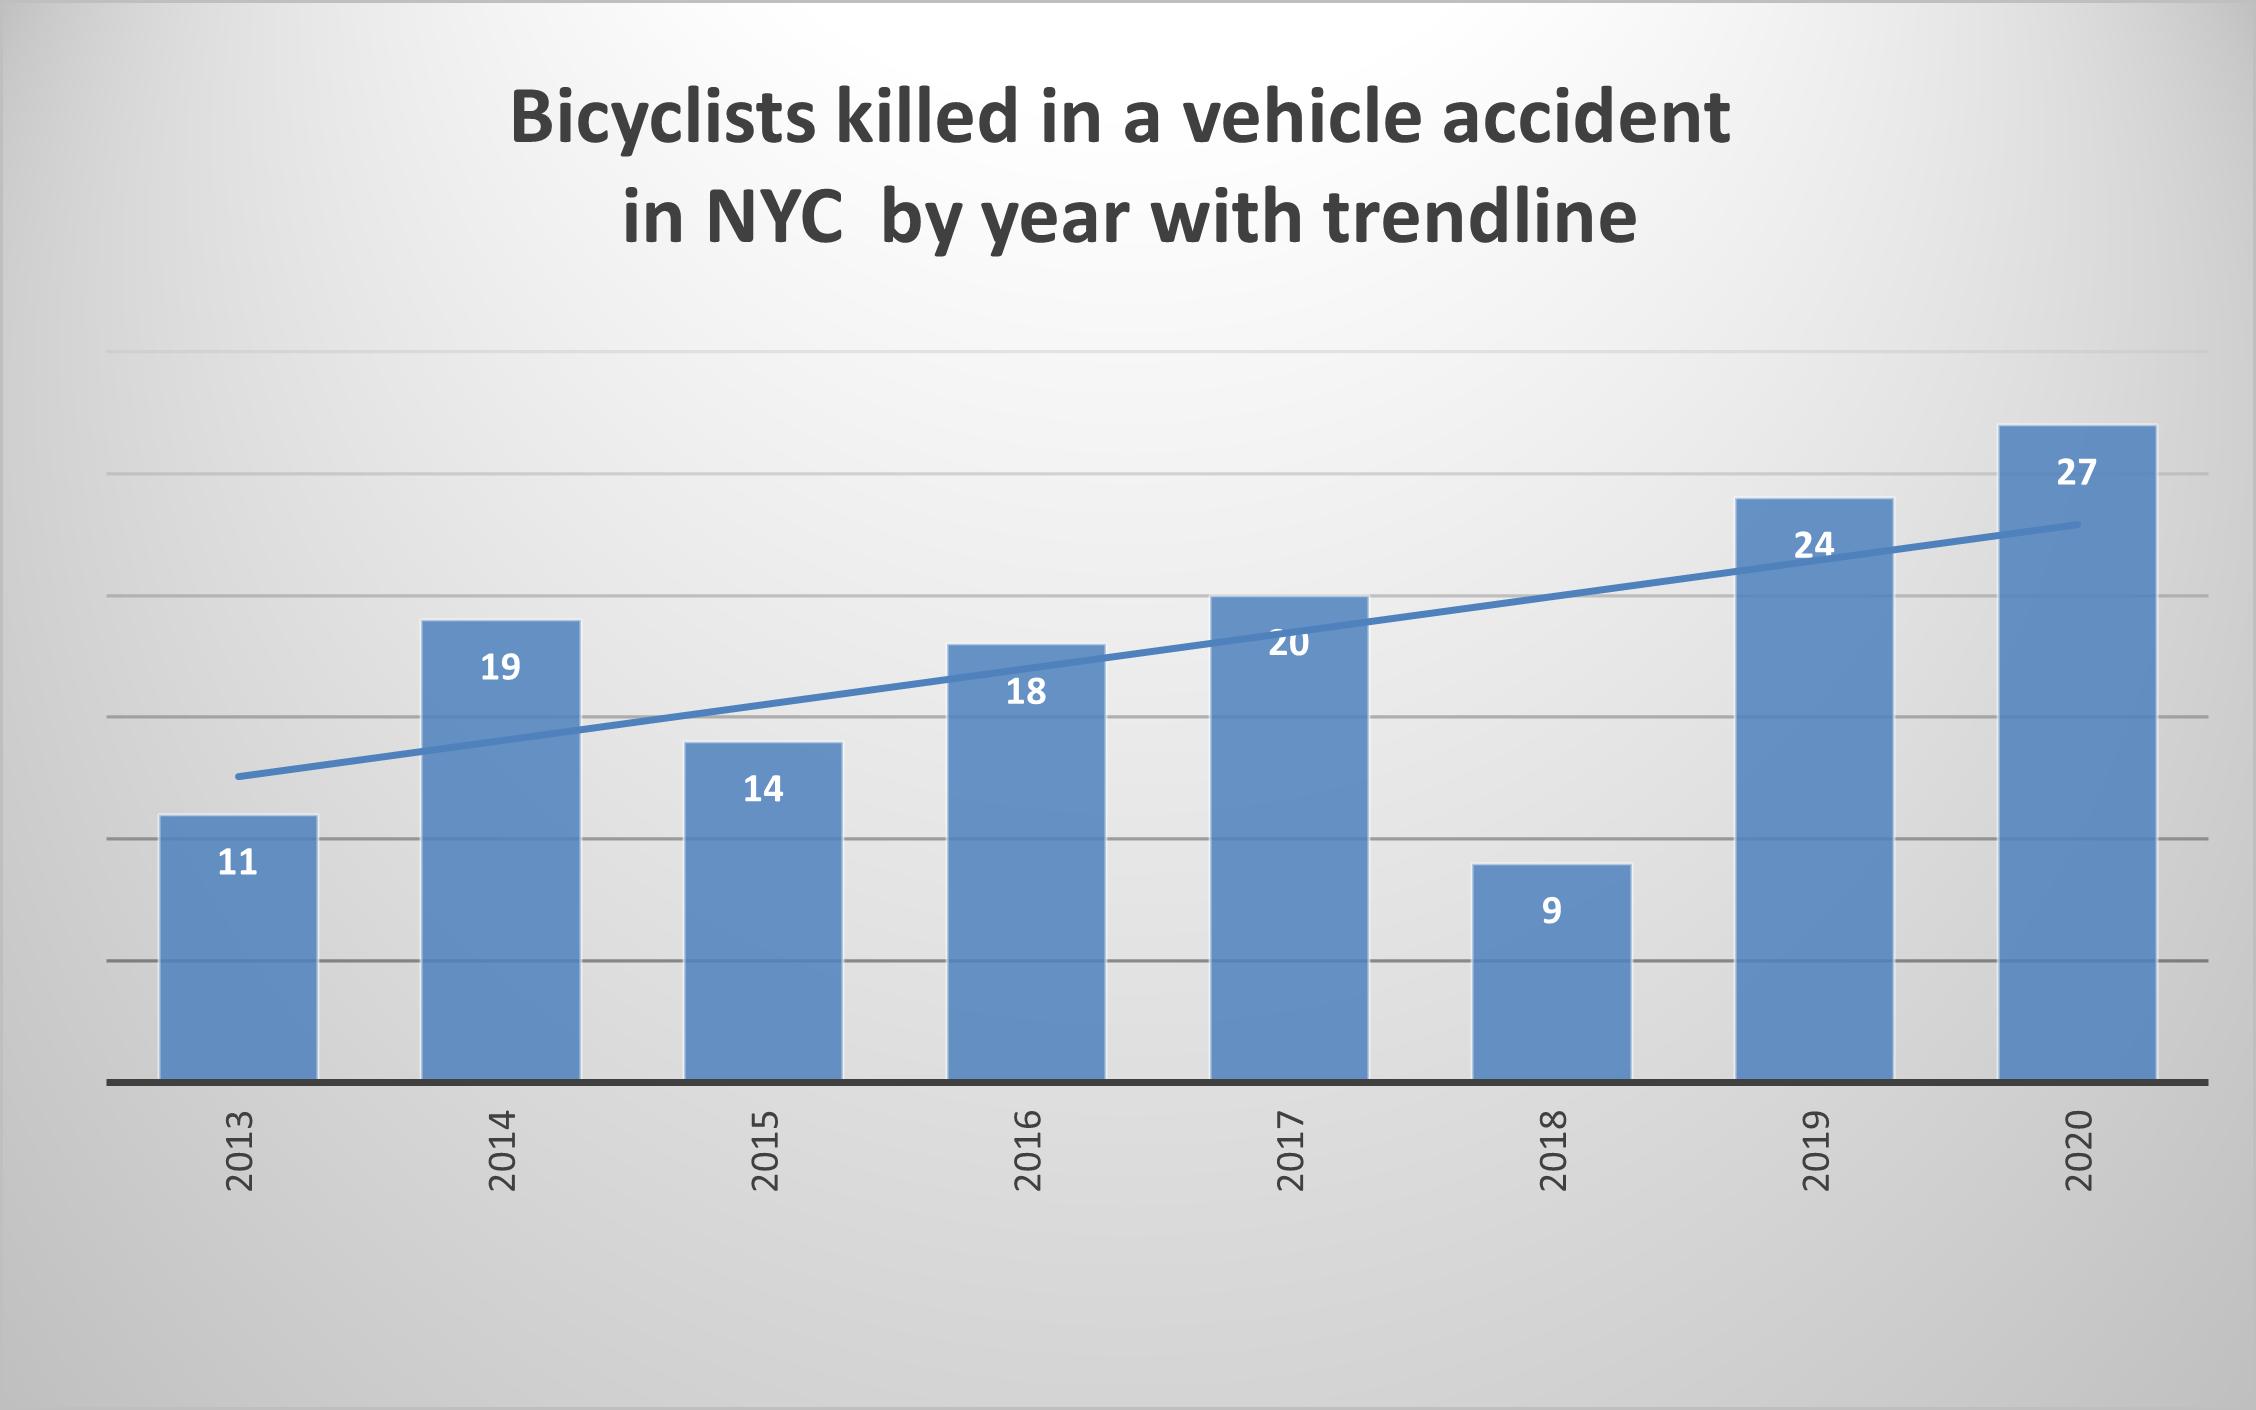 New York Cyclist deaths in 2020